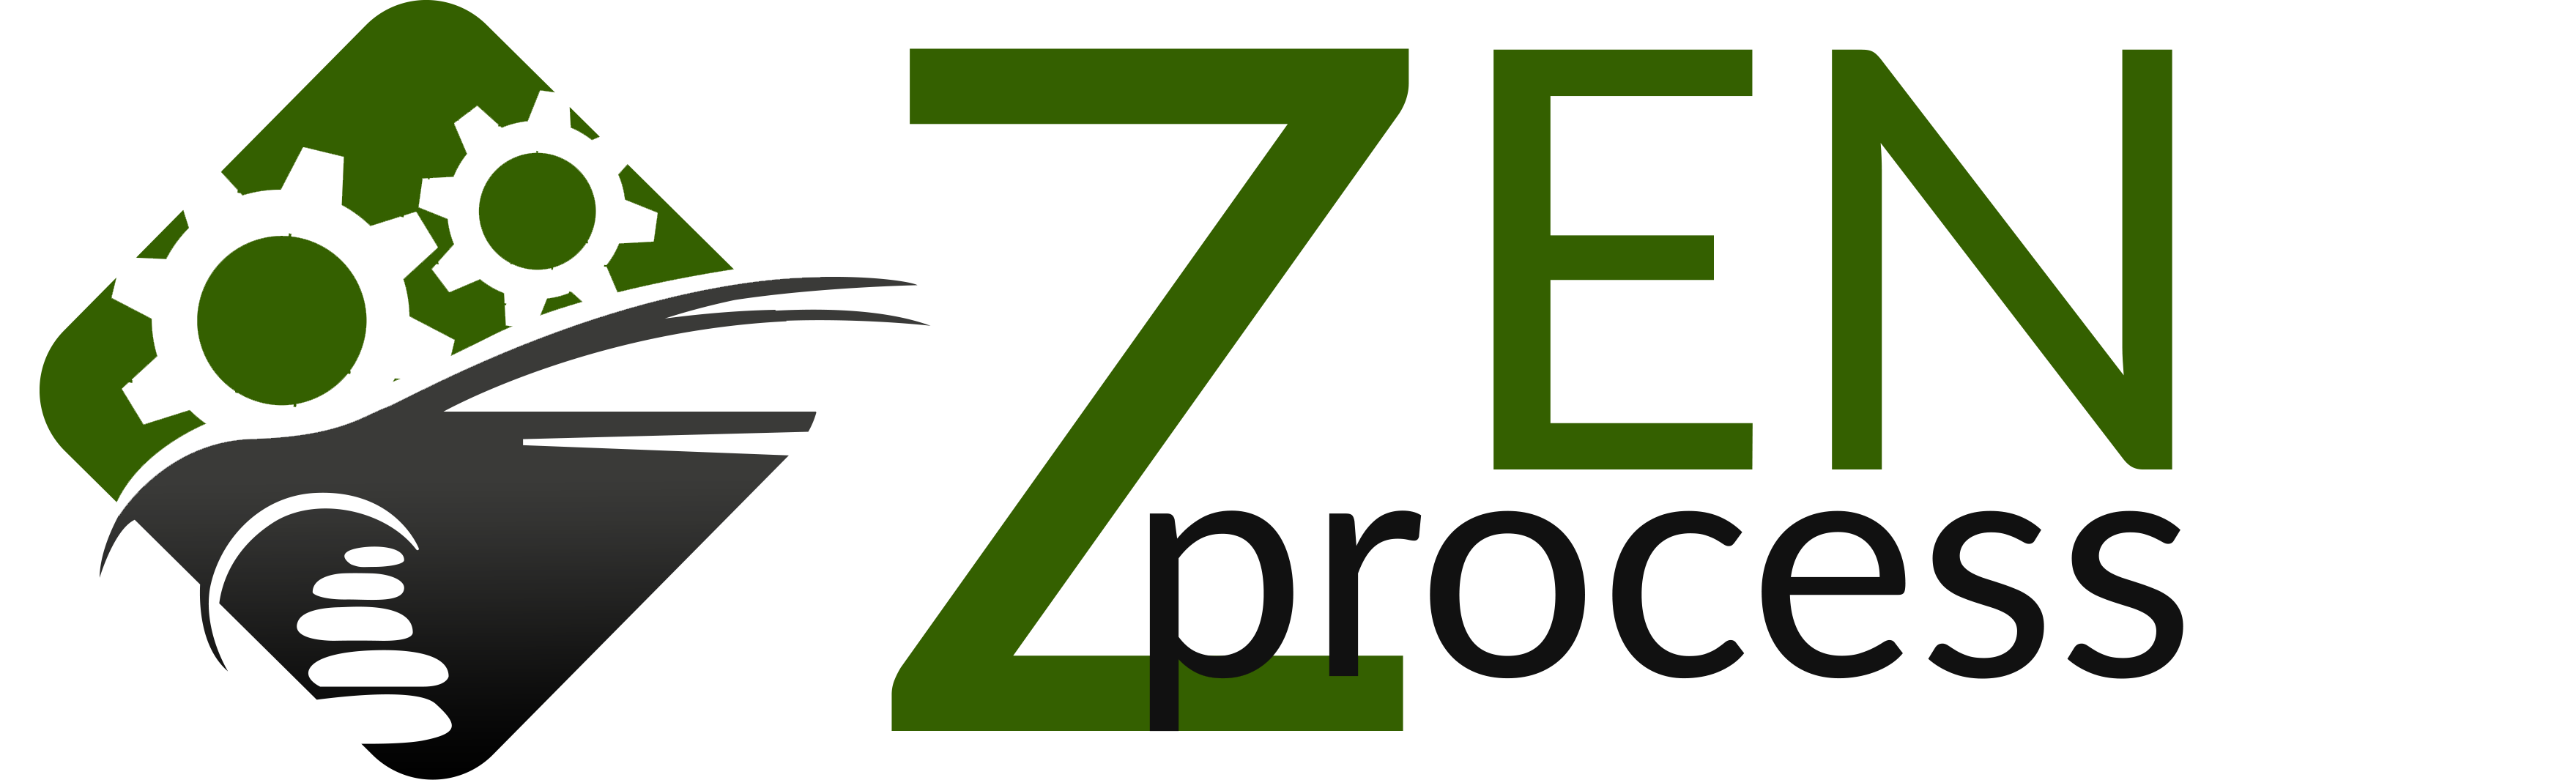 Zen Process - Your digital transformation partner